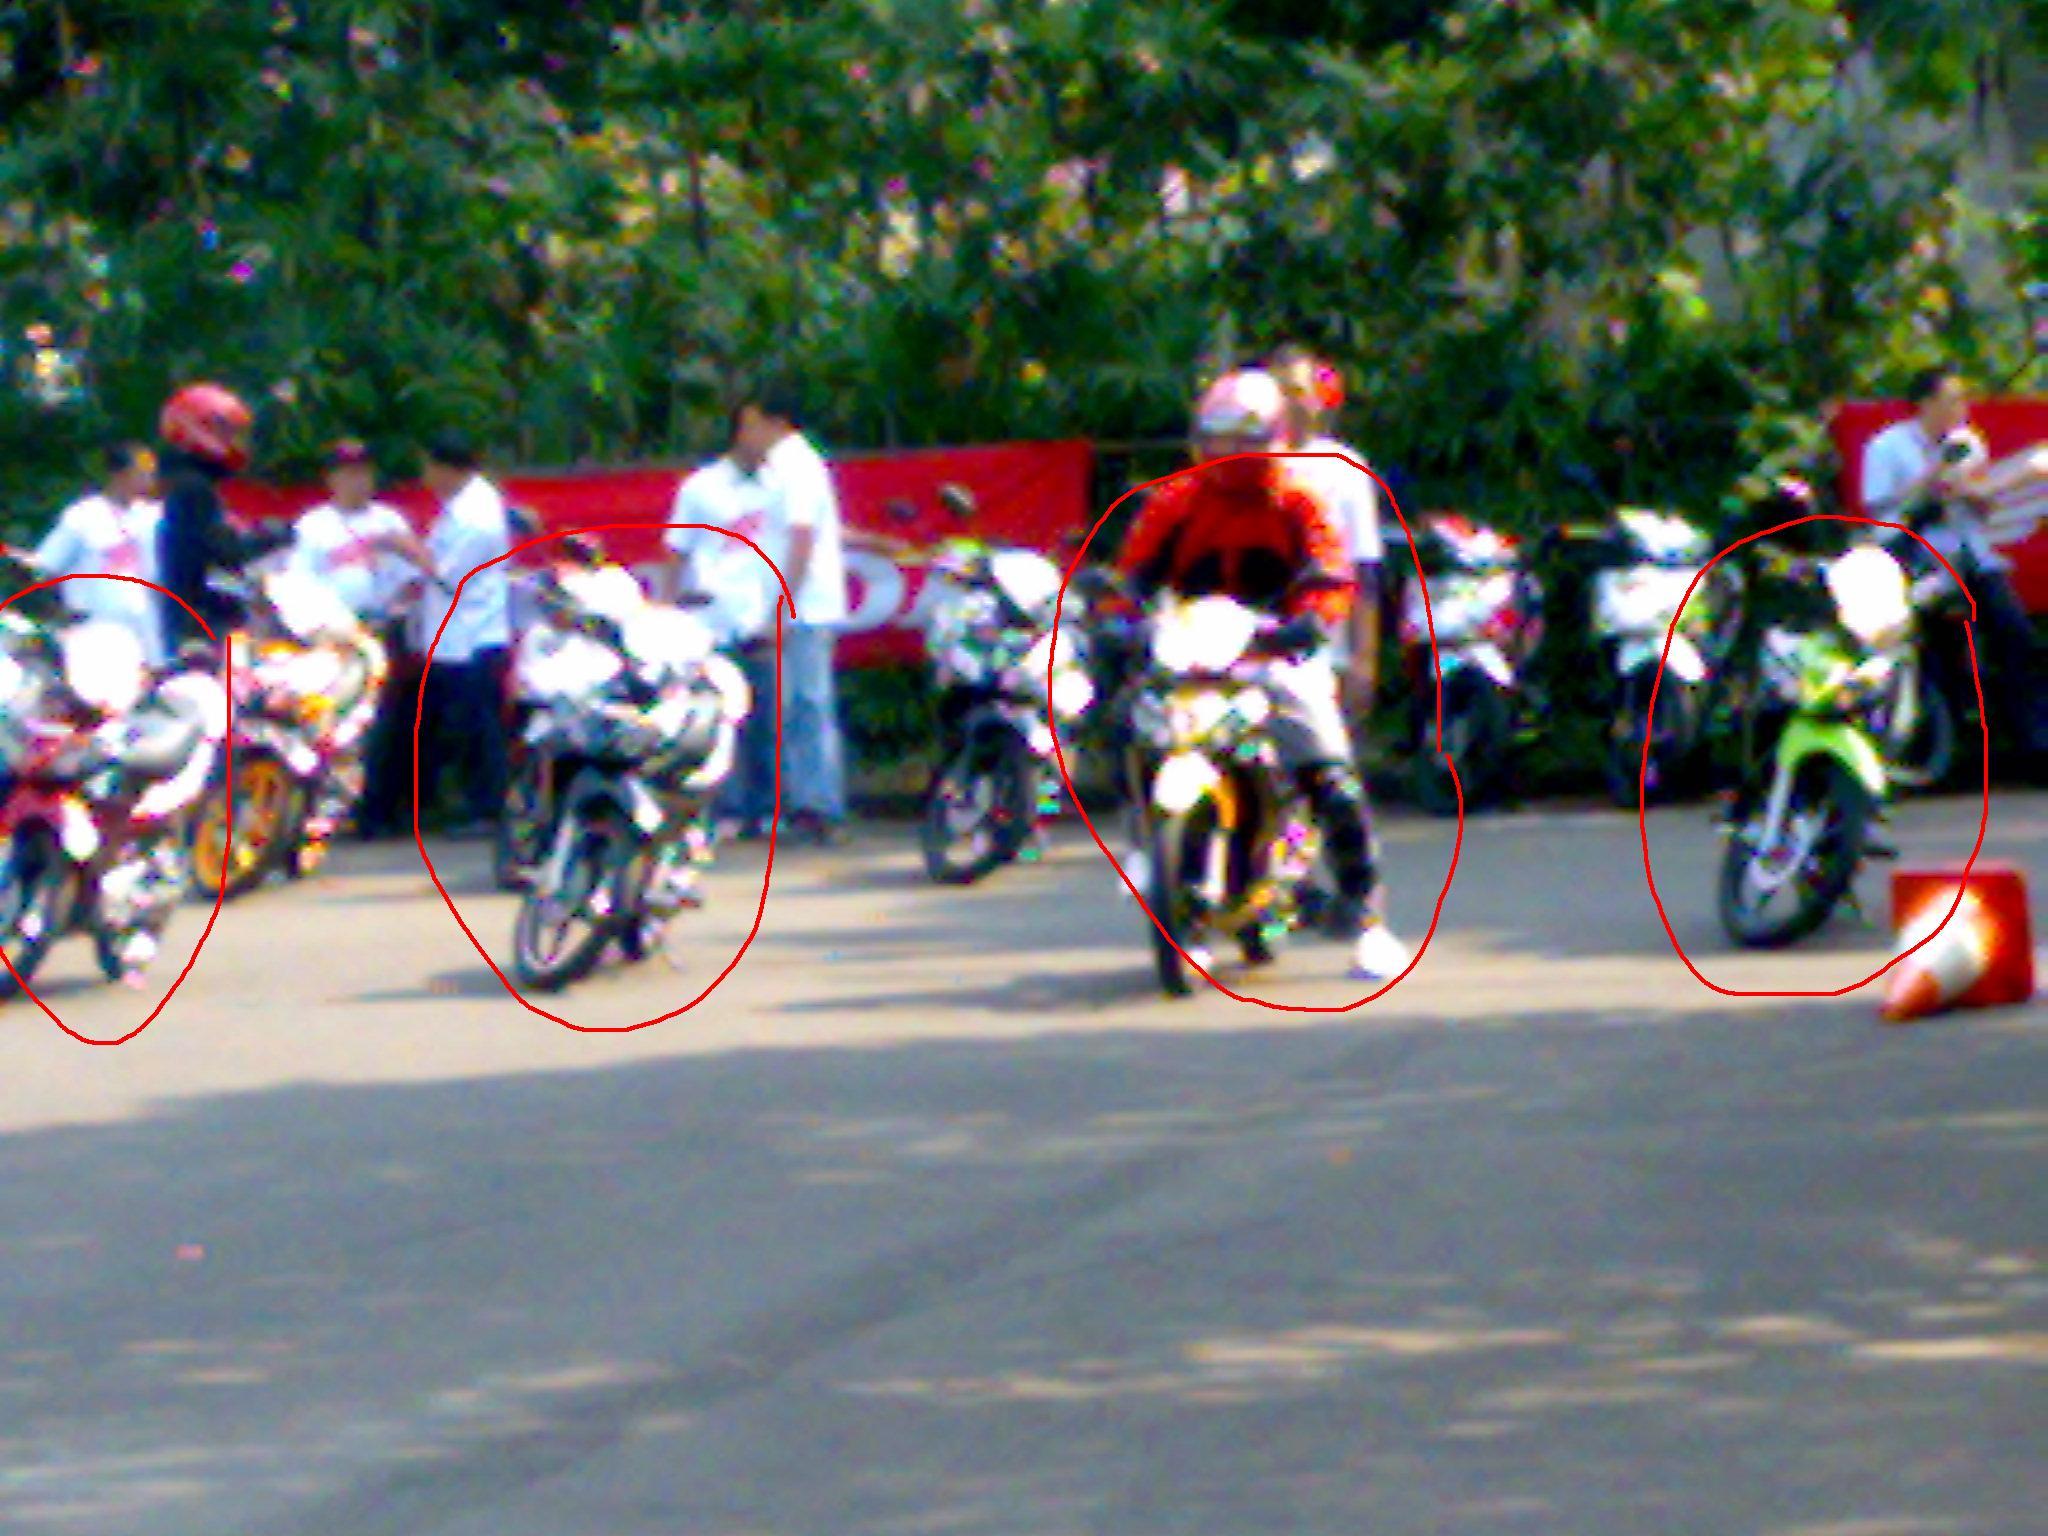 Liat yg dilingkarin merah..motor sodara kembarnya kok ikutan di adu   278cbac7c3